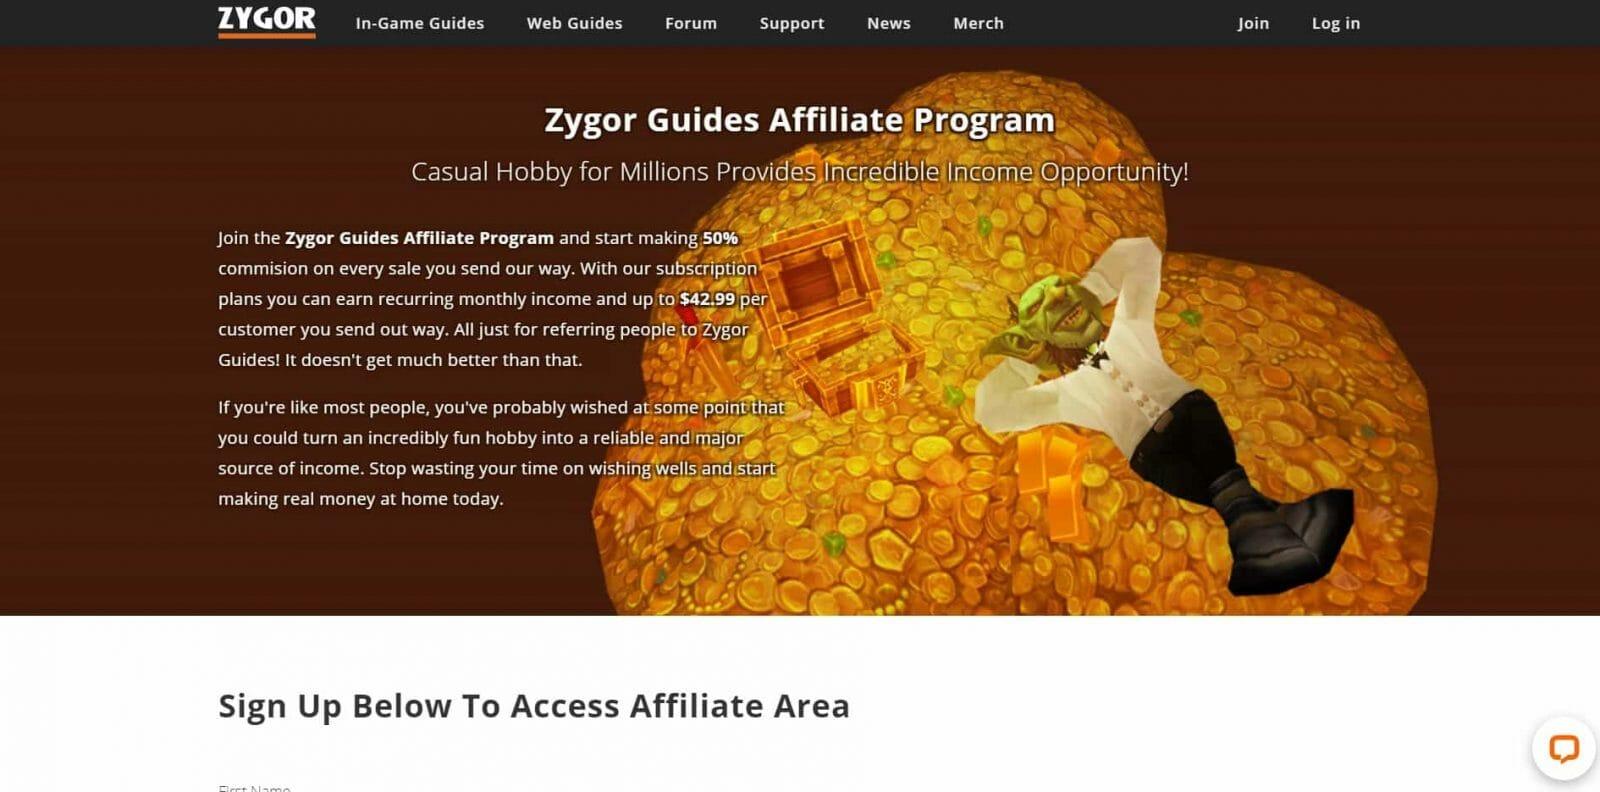 Zygor Guides Gaming Affiliate Program